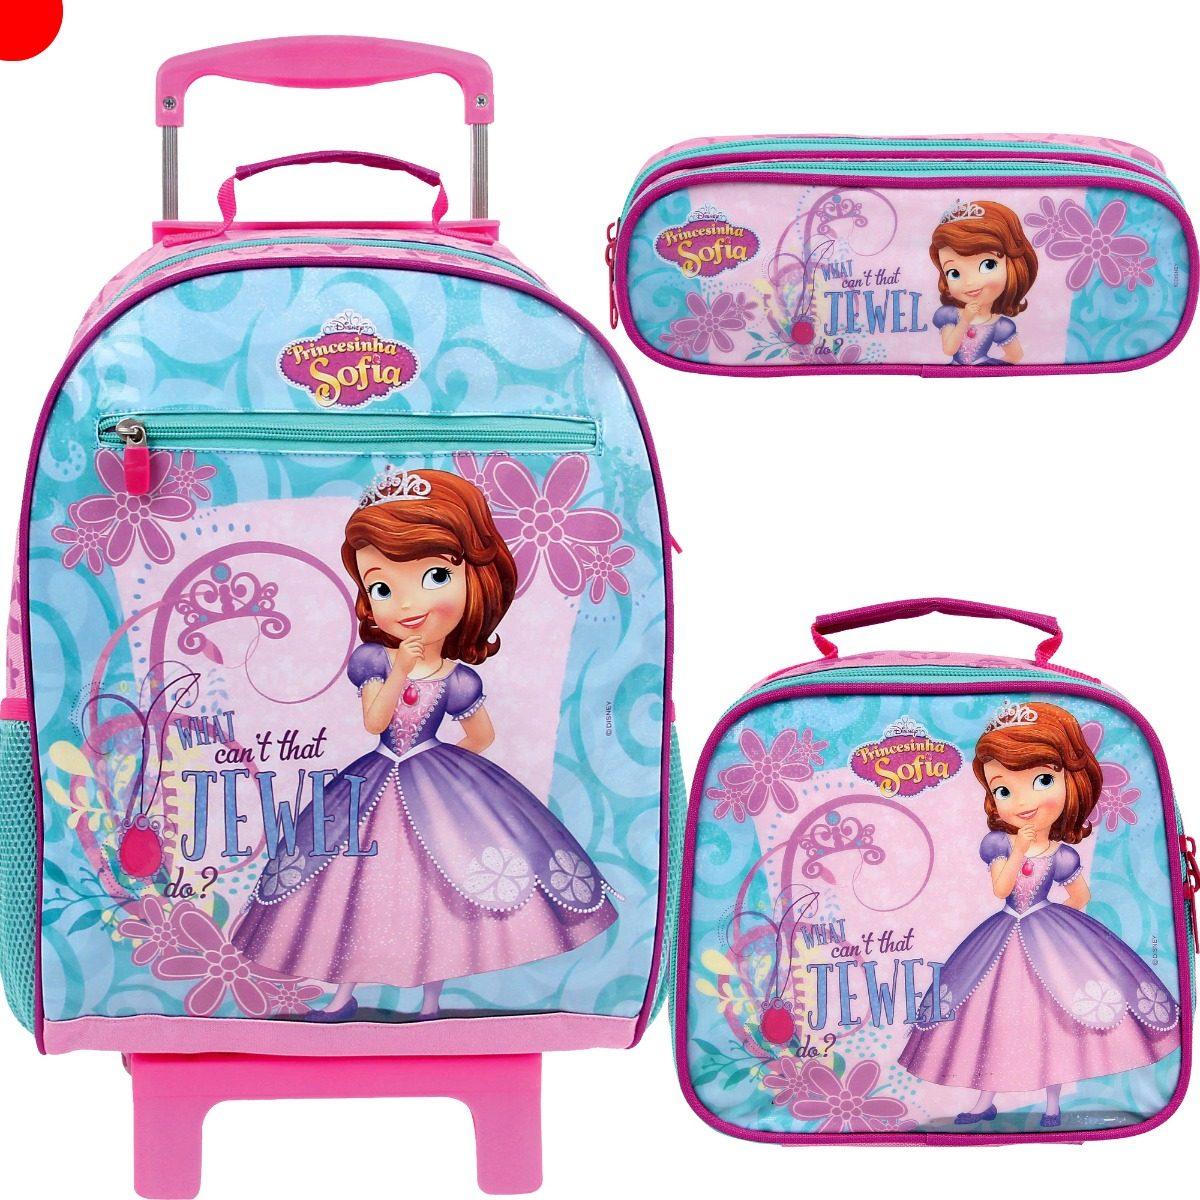 027b2c58a6 kit mochila escolar lancheira estojo princesa sofia dermiwil. Carregando  zoom.